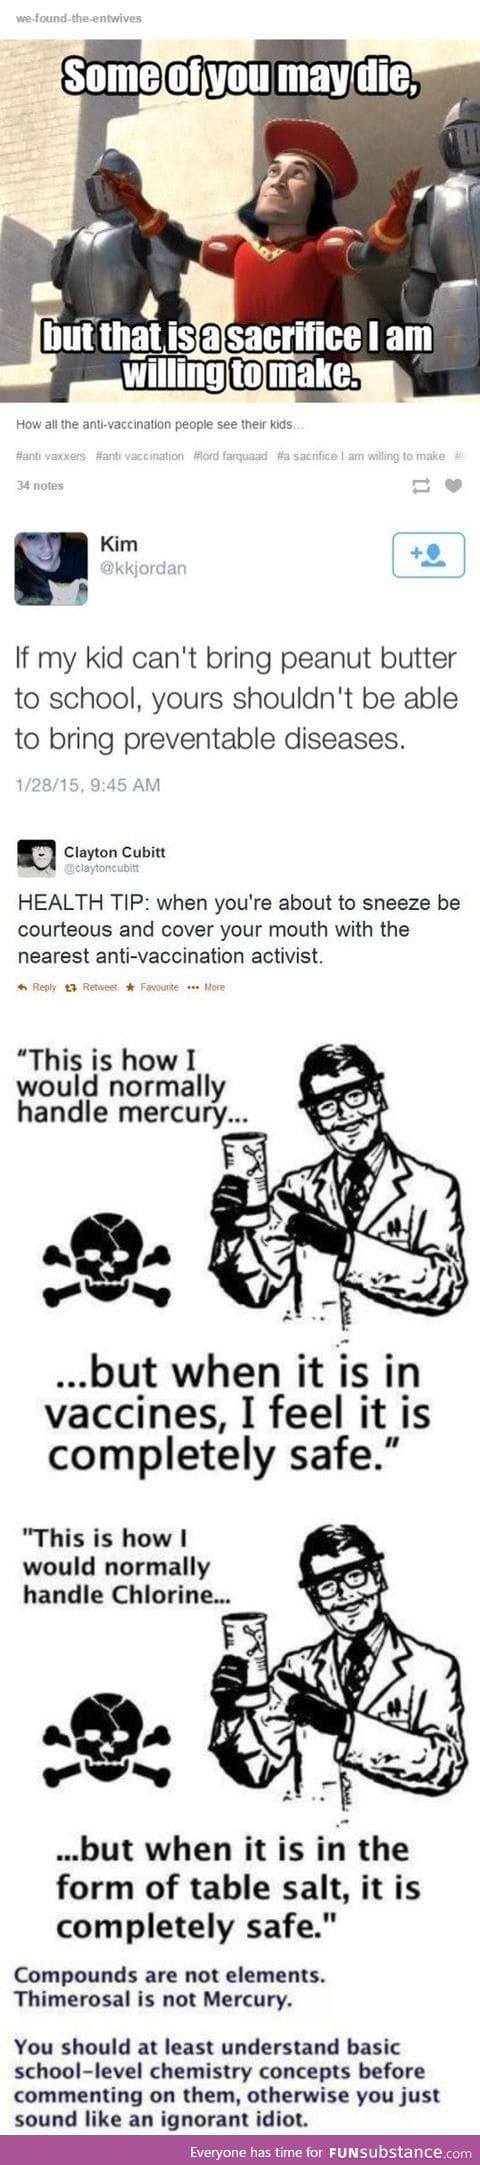 Anti-vaxxers logic